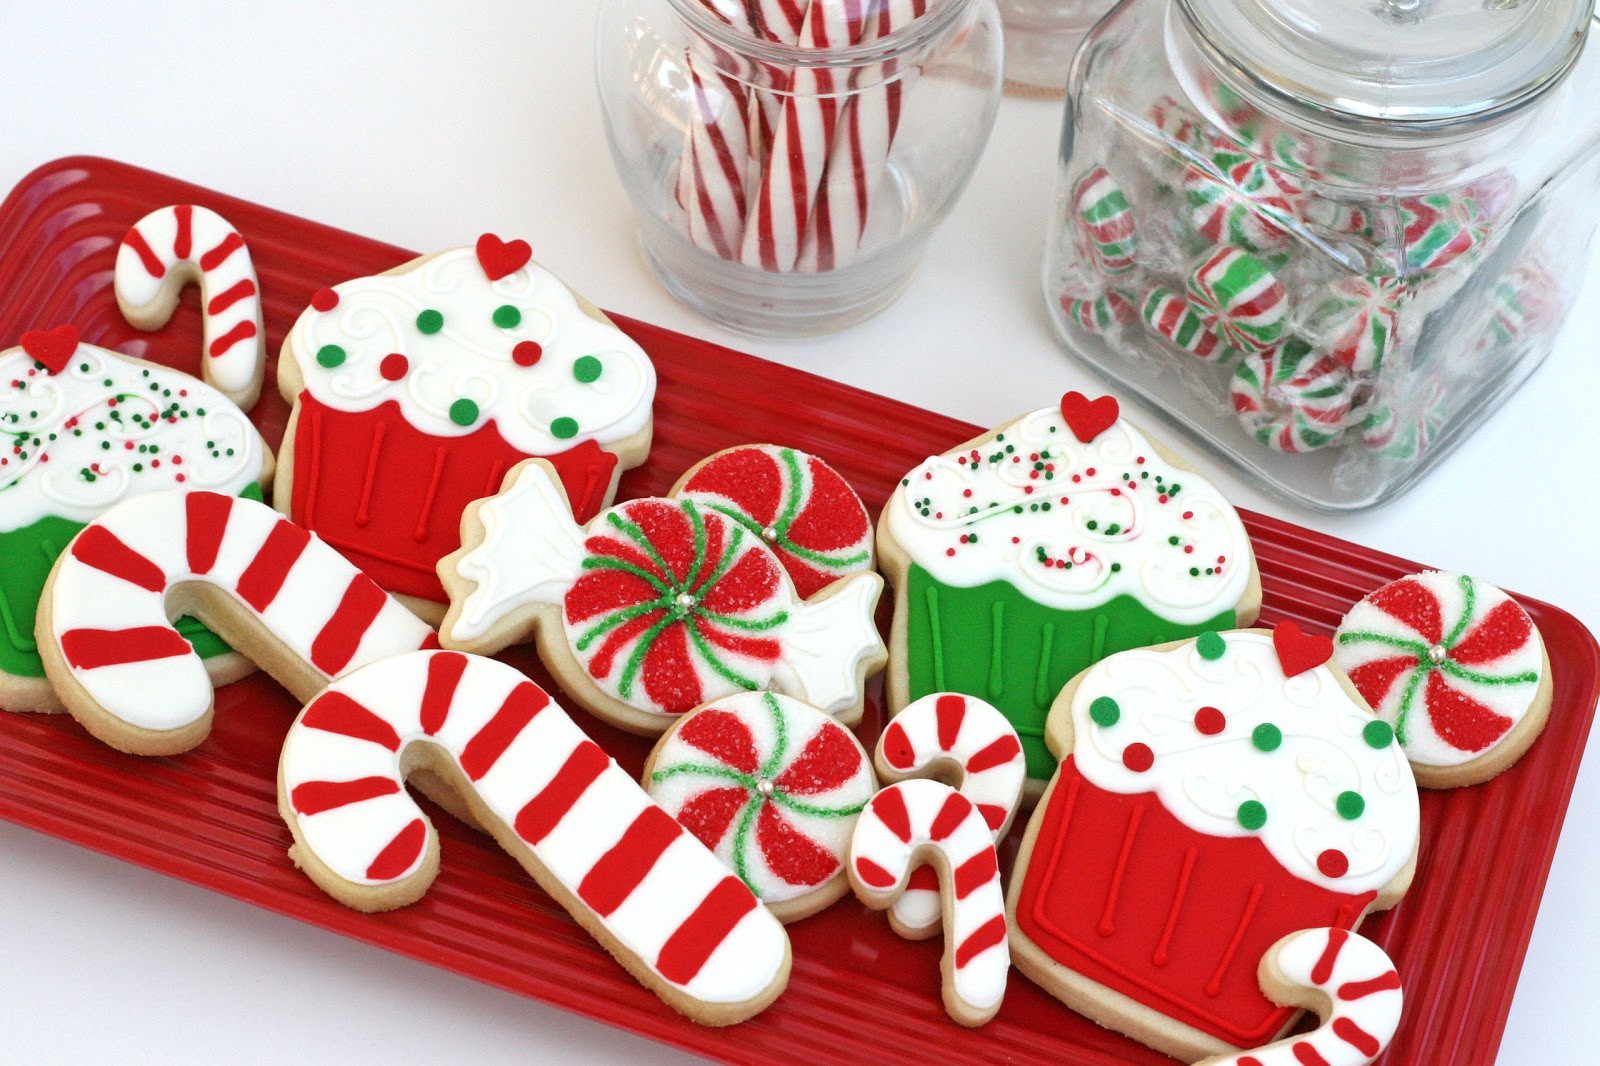 Baking Christmas Cookies  Christmas Cookies Galore Glorious Treats